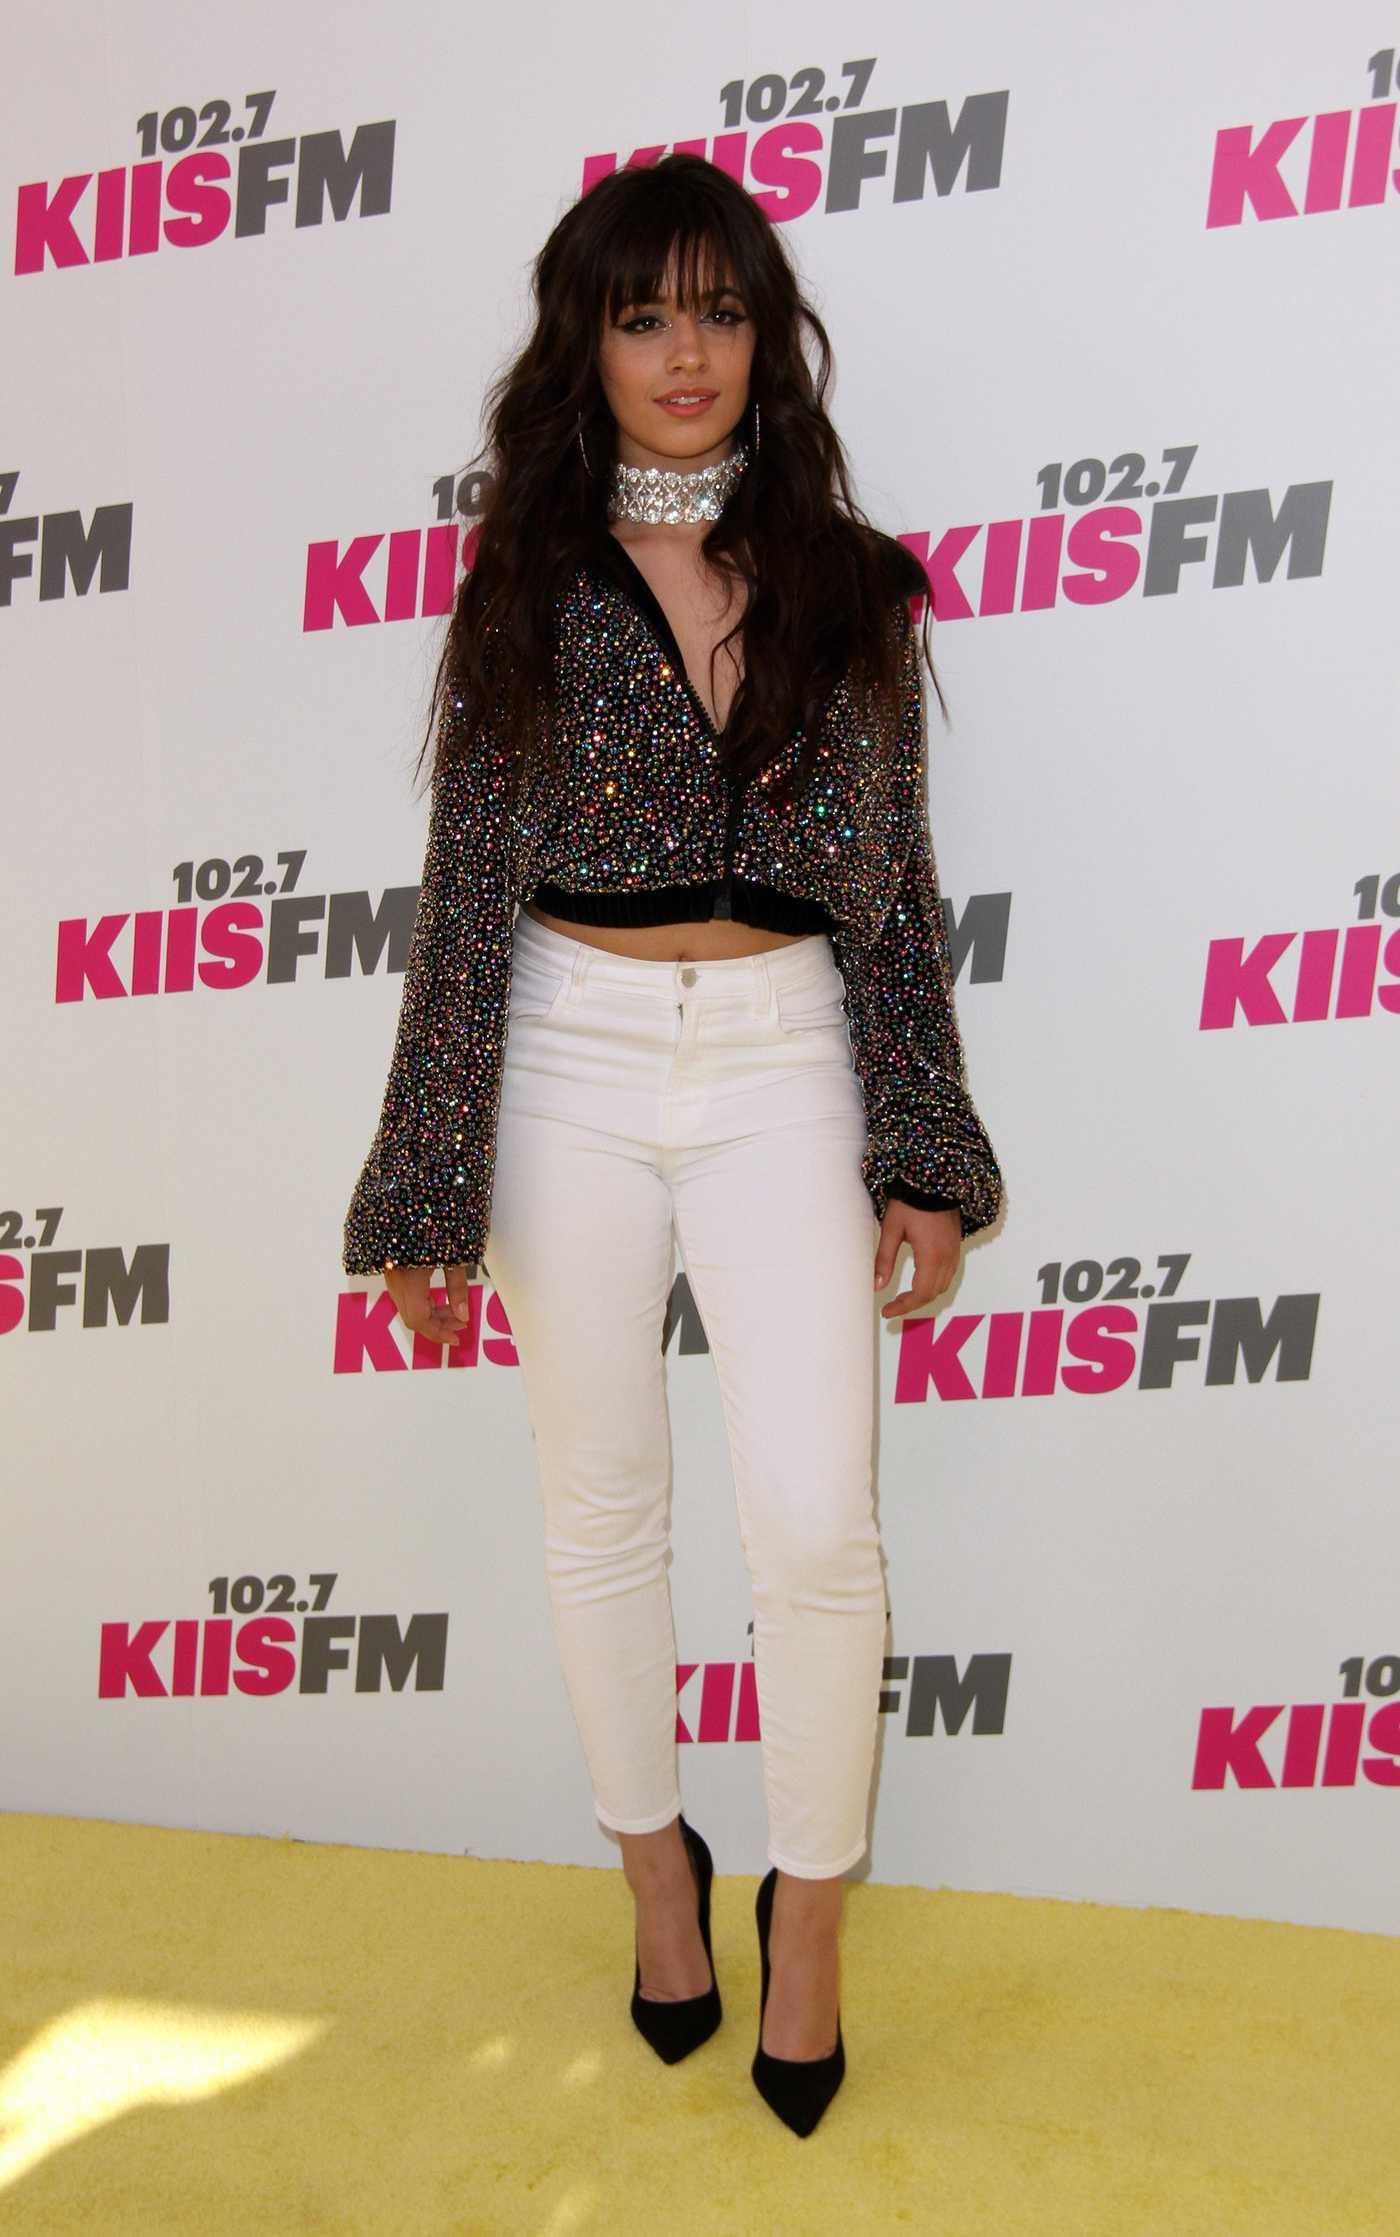 Camila Cabello at the 2017 KIIS FM Wango Tango in Los Angeles 05/13/2017